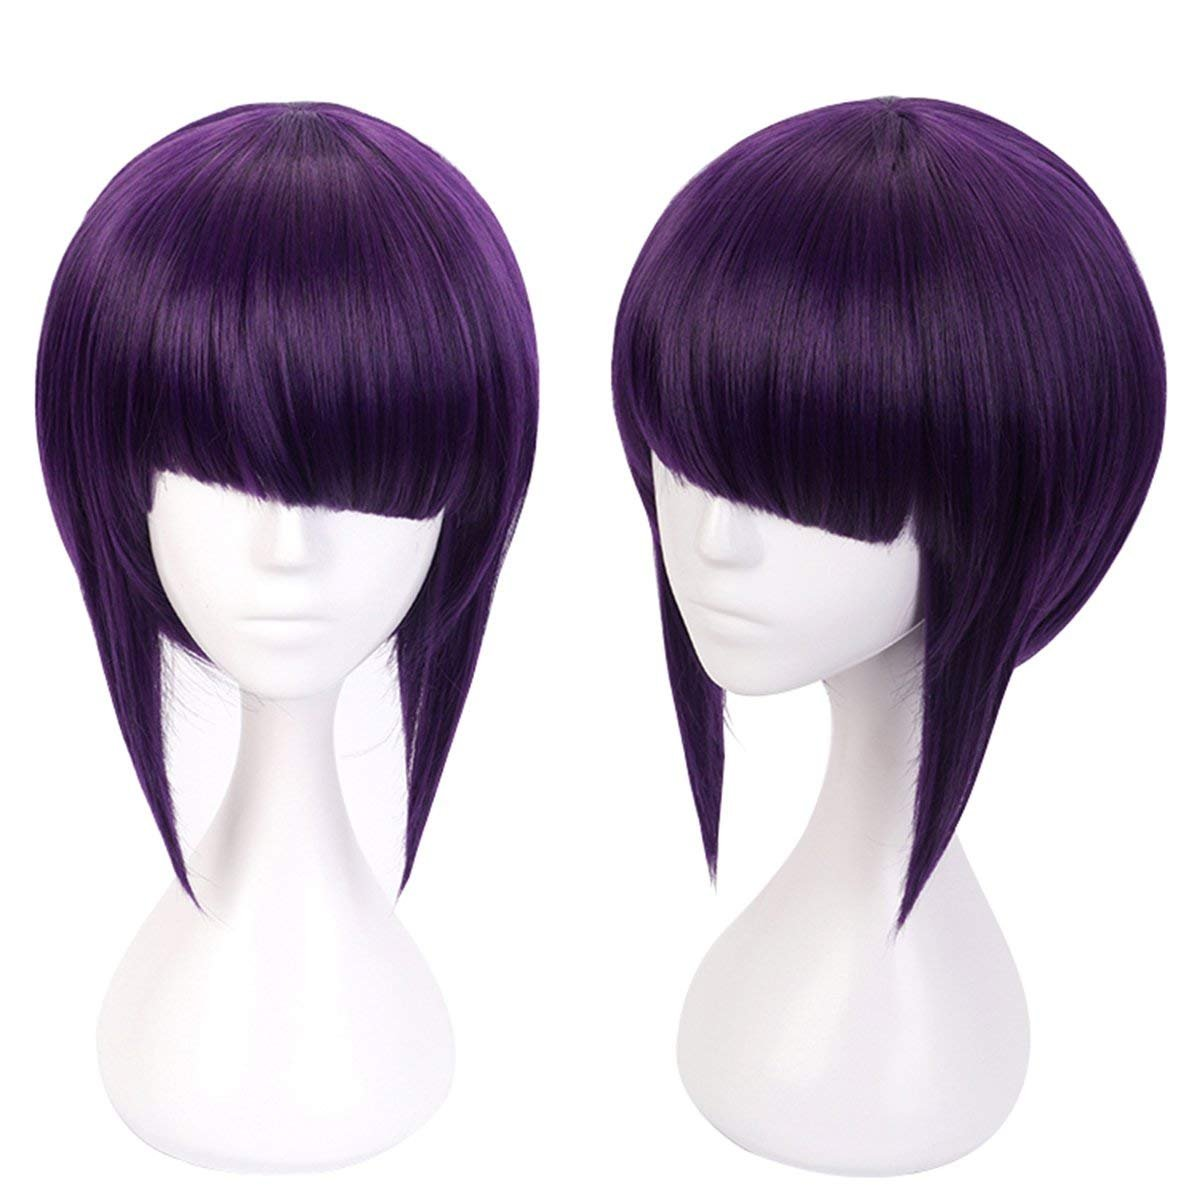 Ani·Lnc Anime Cosplay Perücke kurze grüne schwarze Haare synthetische Perücken mit freien Kappe Yueniu